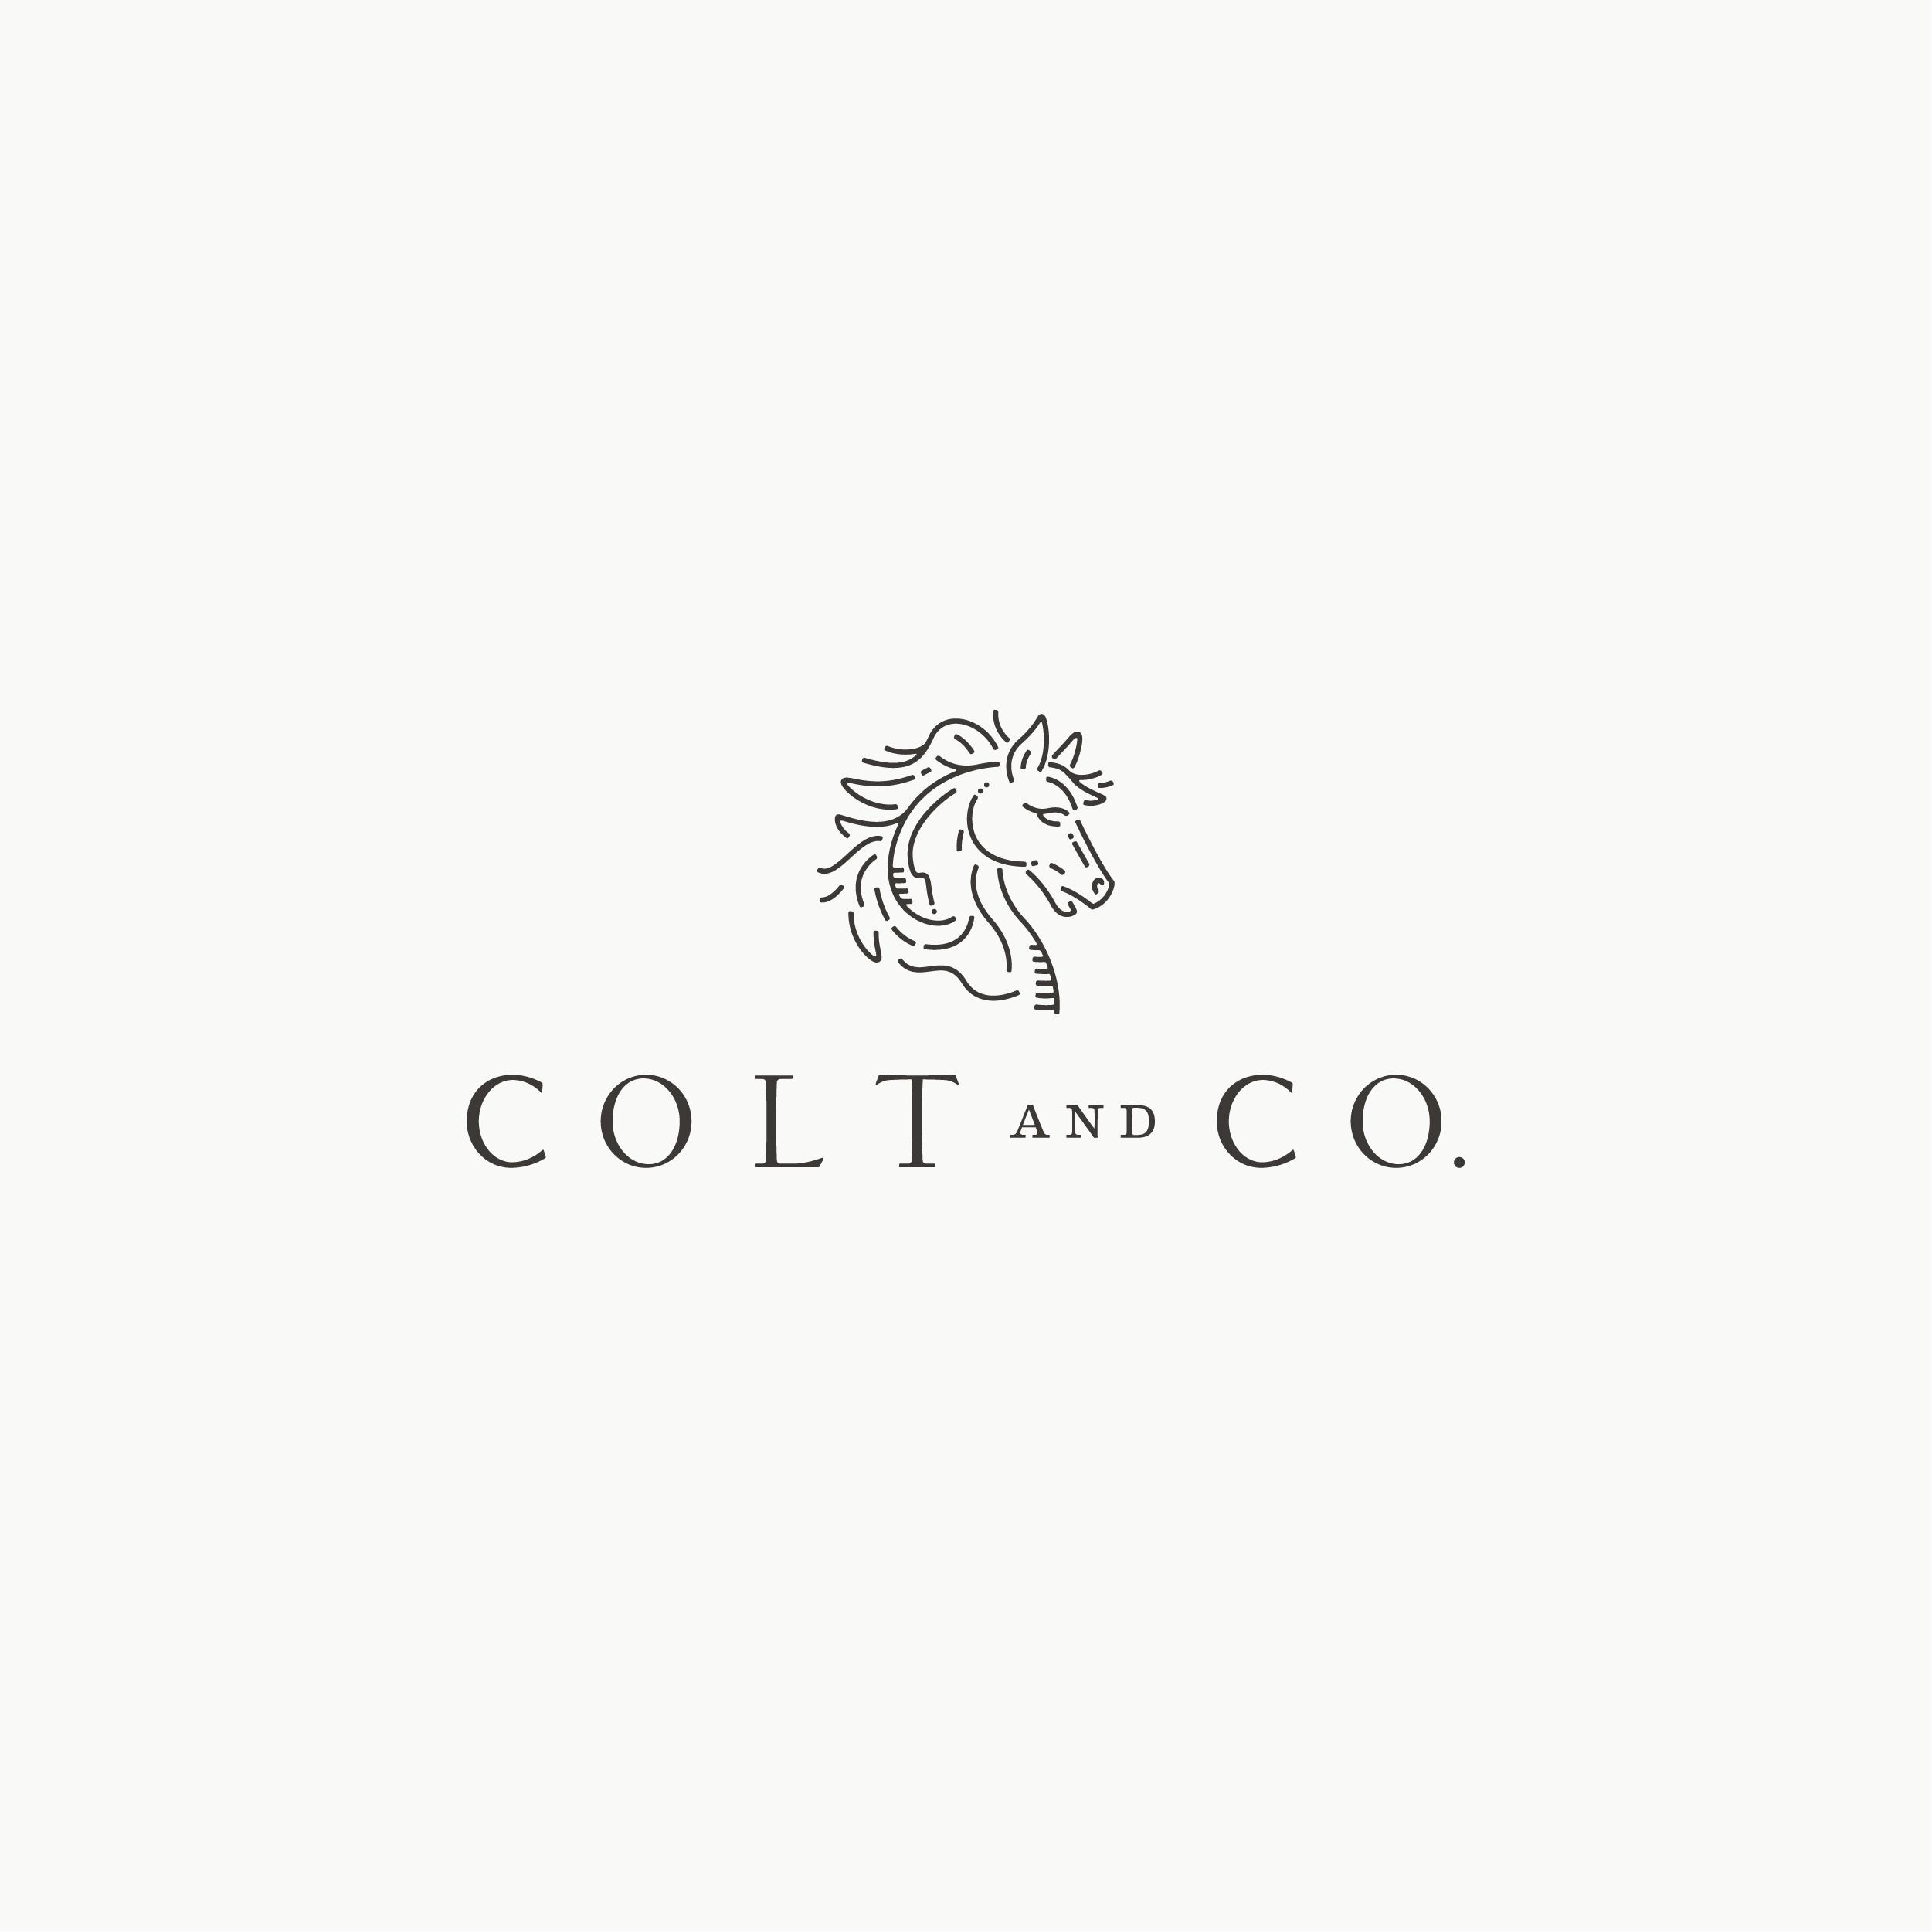 TBS_LogosMarks_ColtAndCo